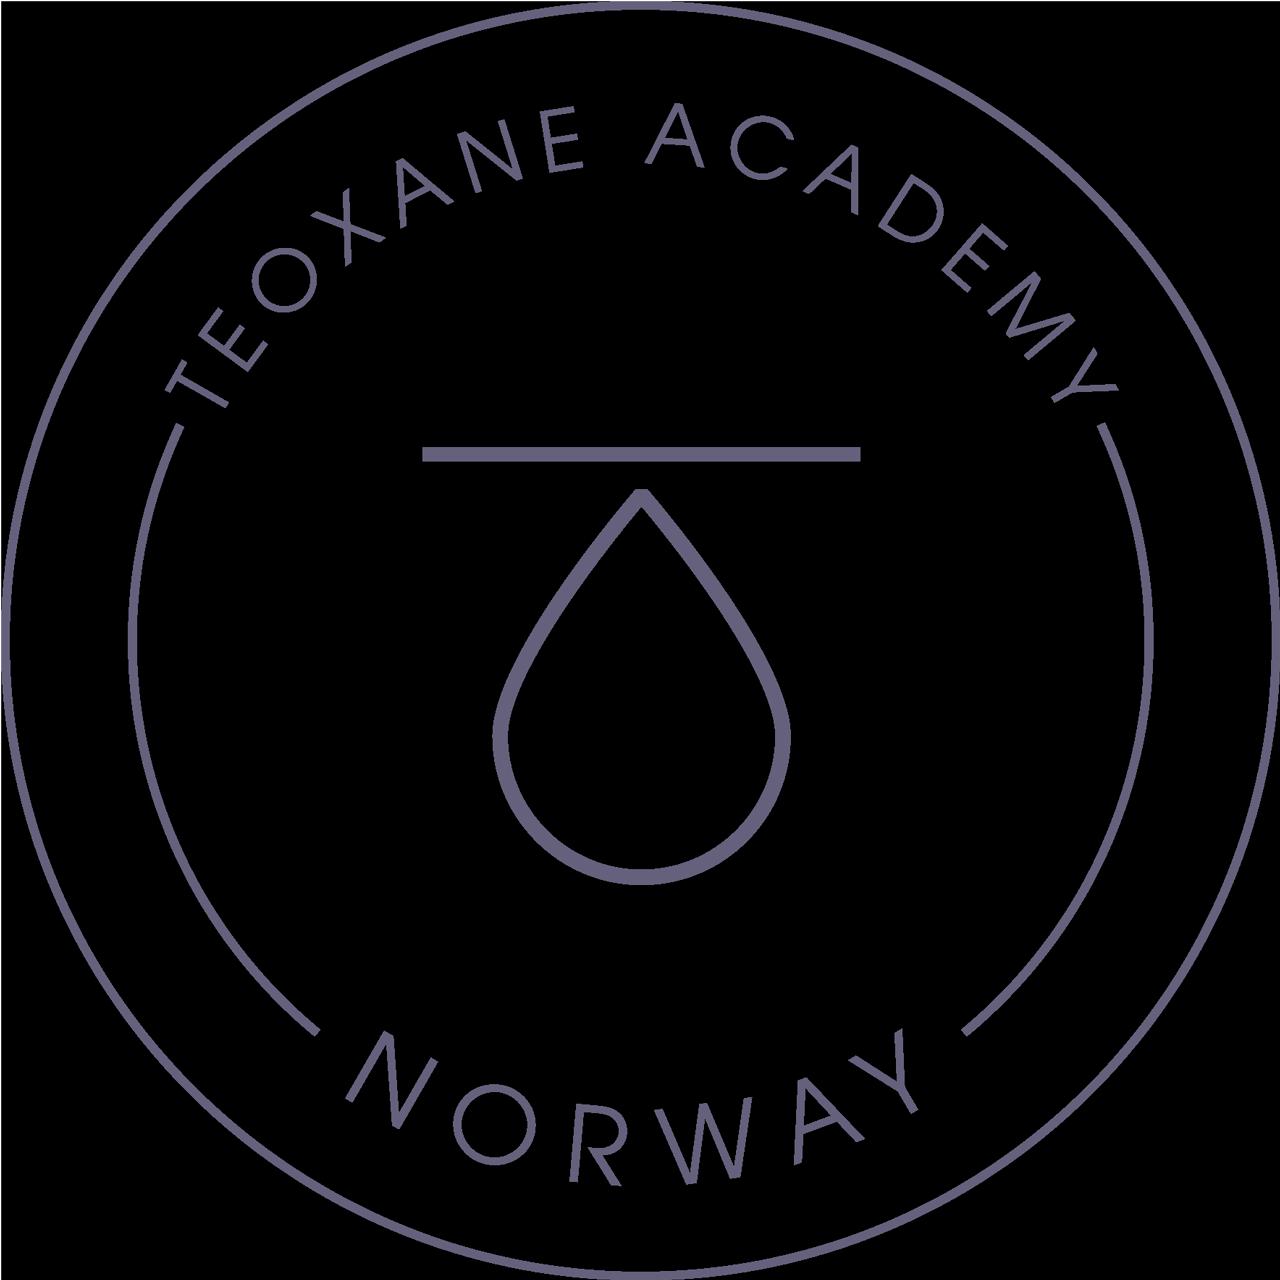 Teoxane Academy Norway logo